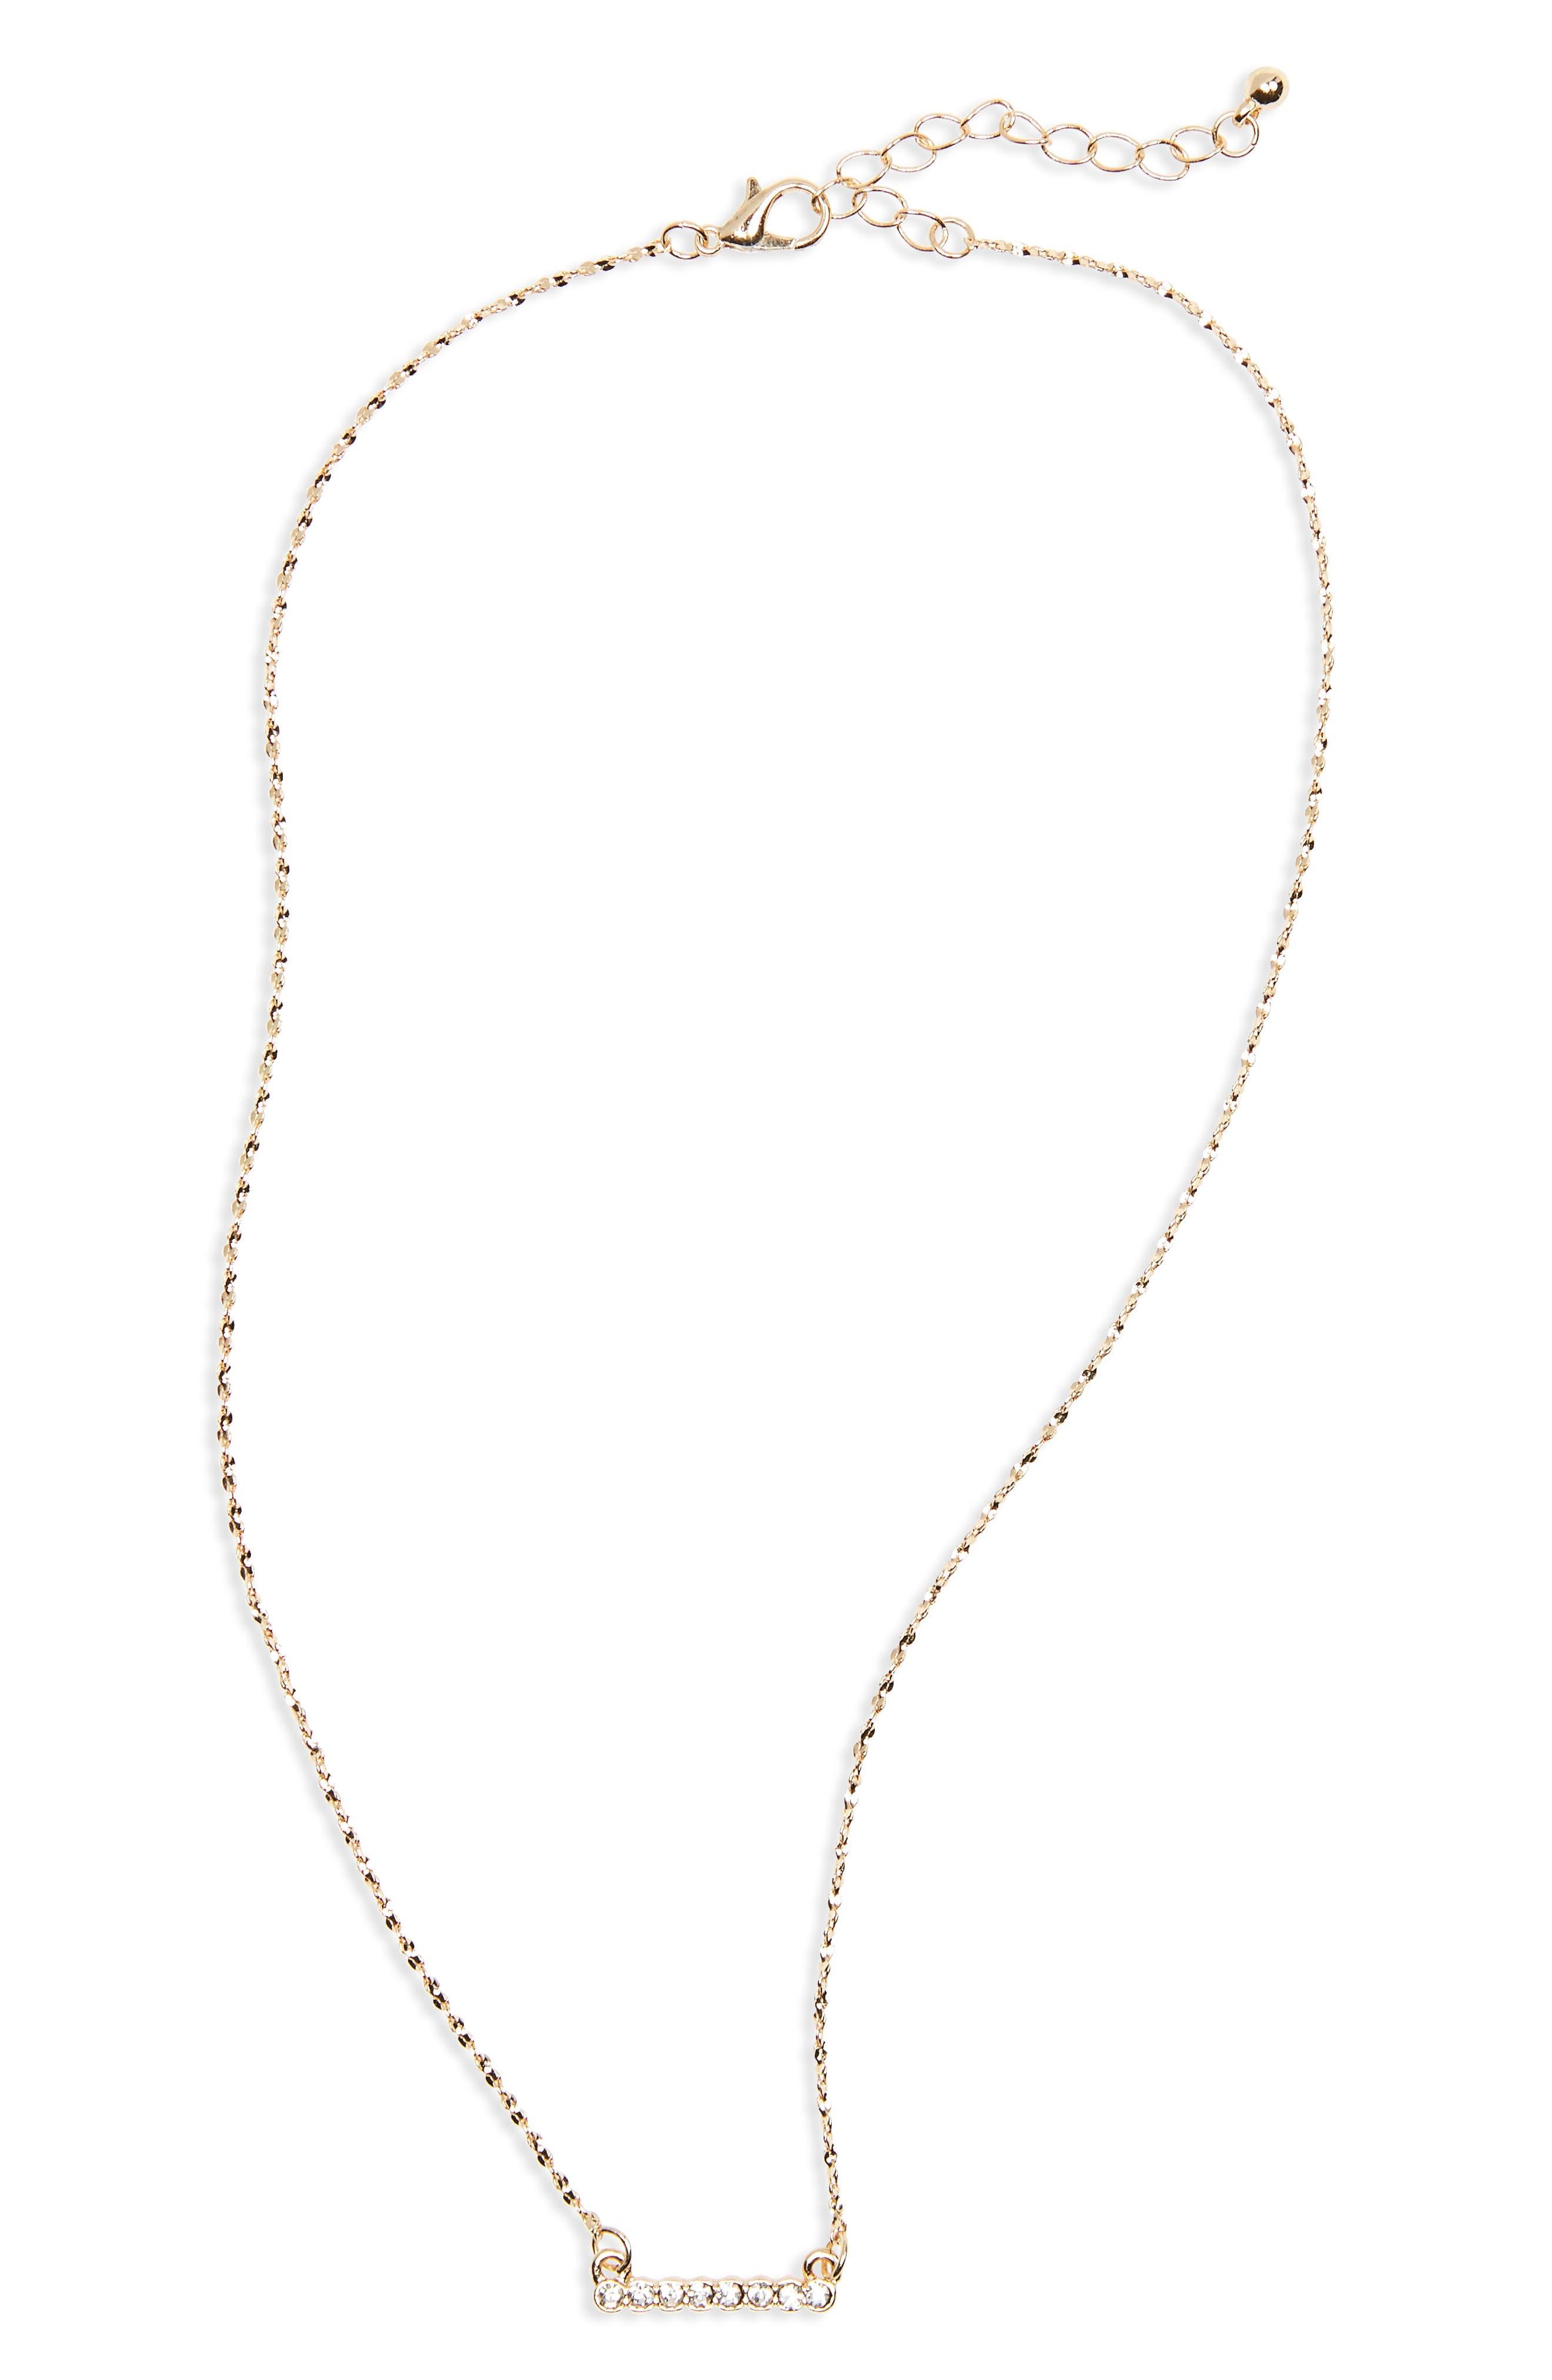 Dainty Crystal Bar Necklace,                             Main thumbnail 1, color,                             Gold/ Crystal